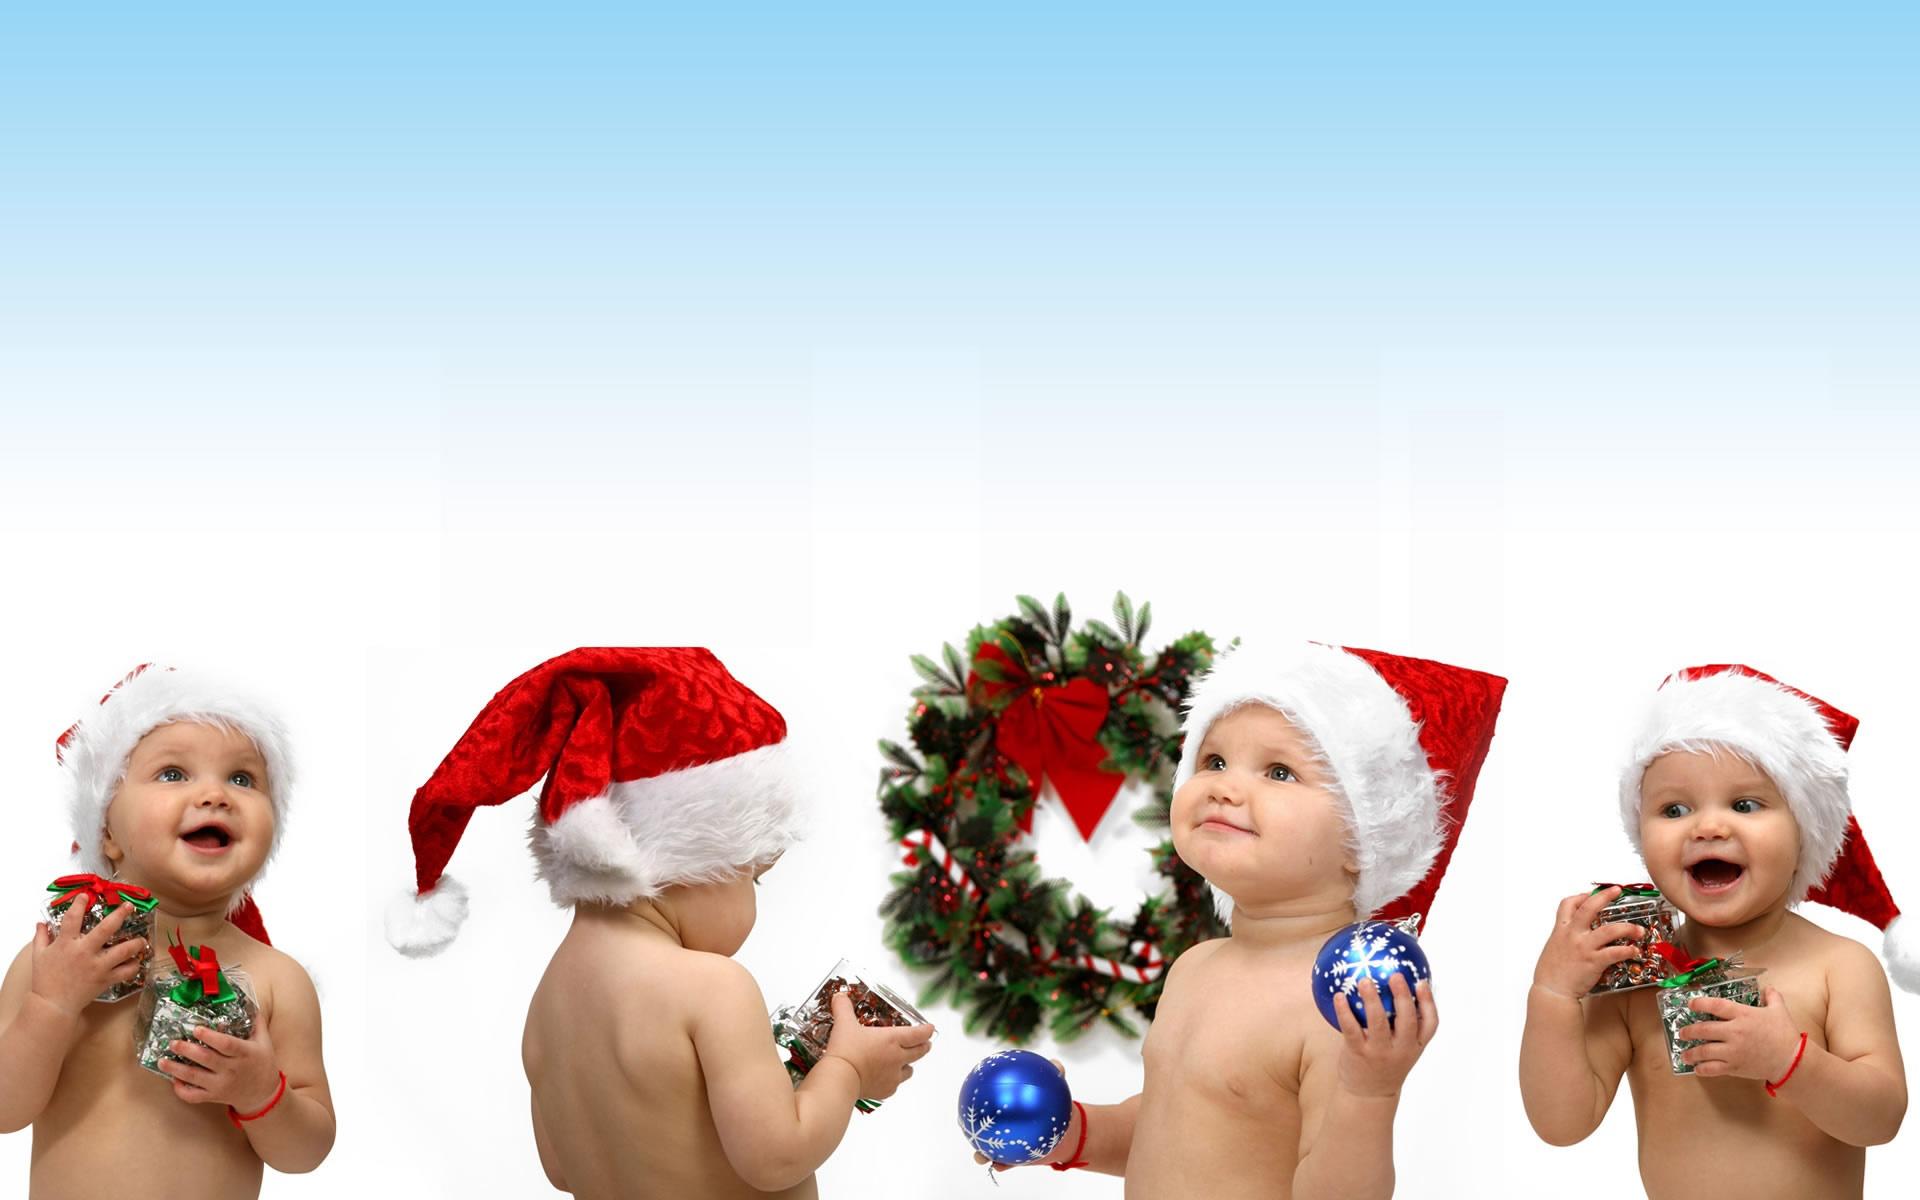 photo christmas backgrounds for children 2015   Grasscloth Wallpaper 1920x1200